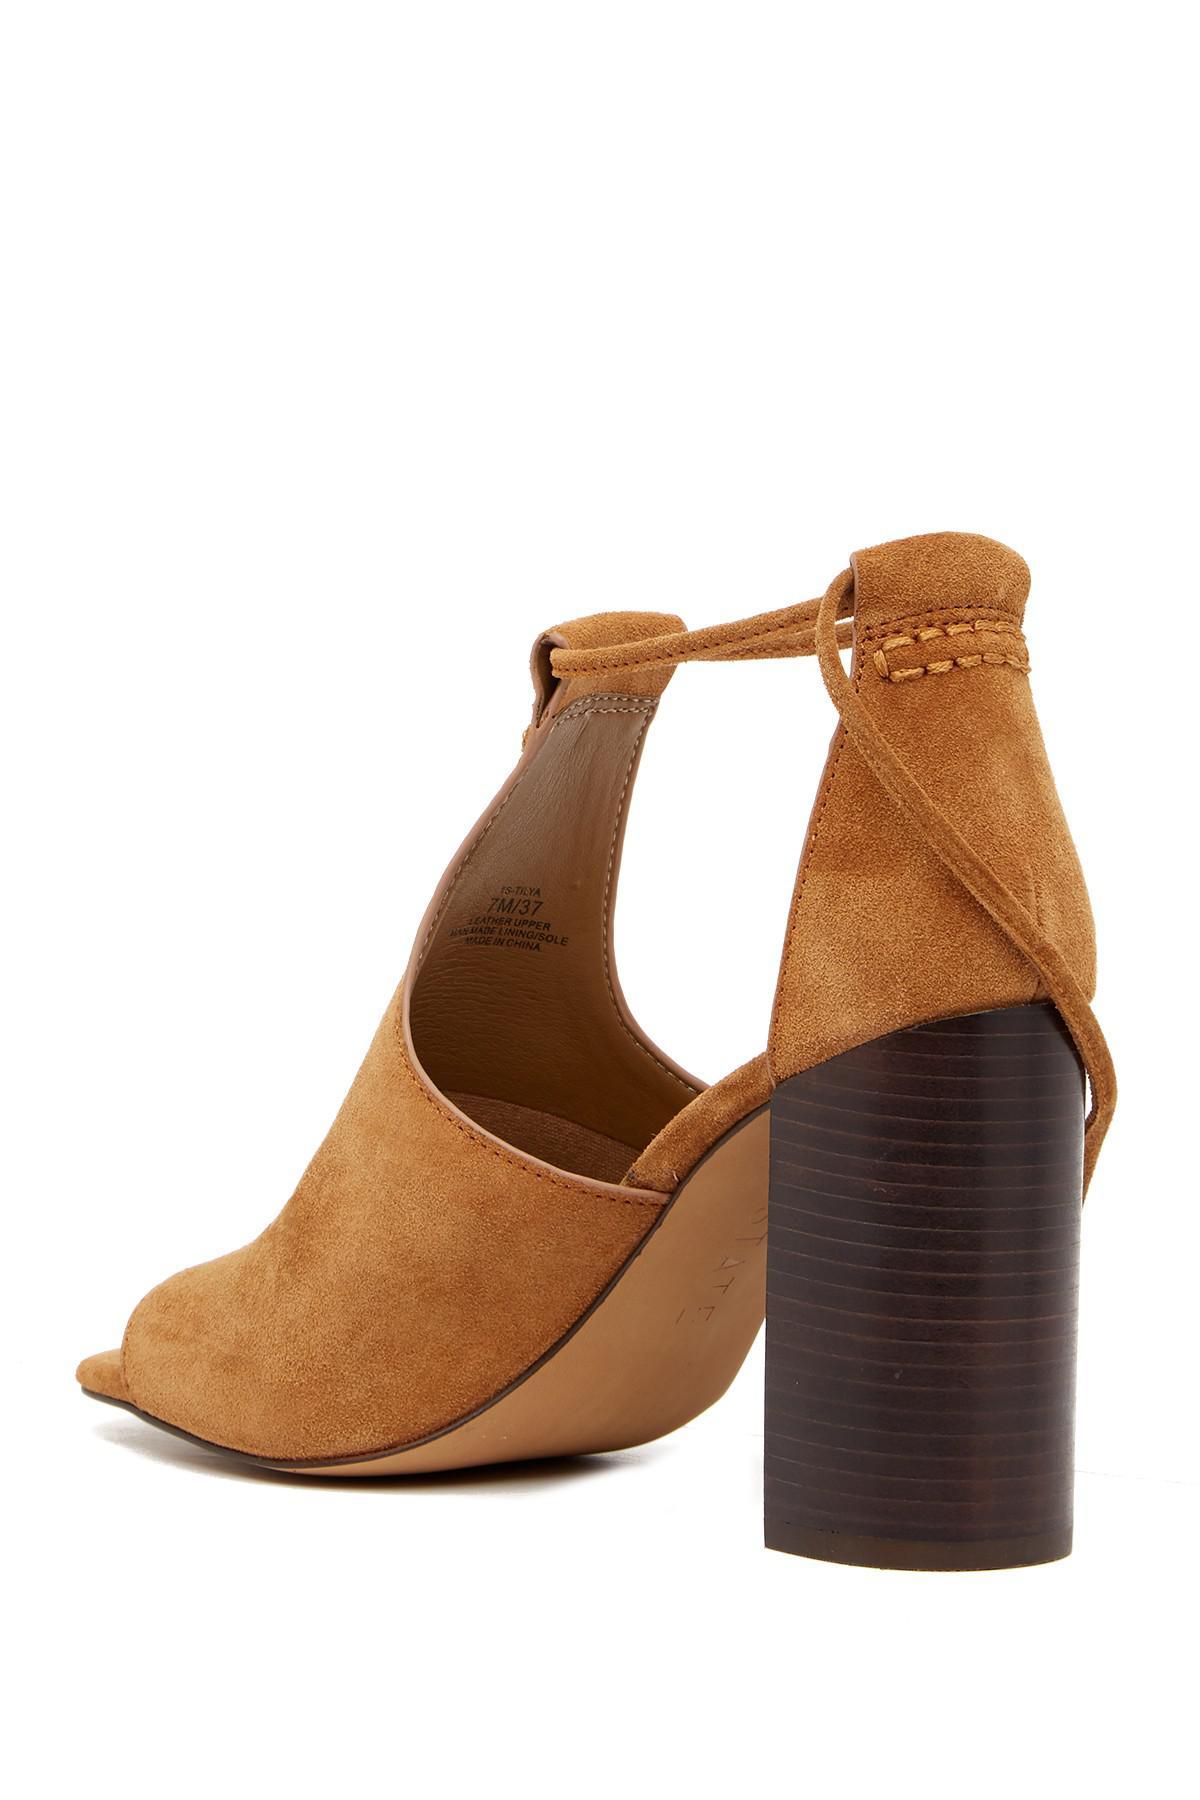 1.State Tilya Block Heel Sandal 51pzBd